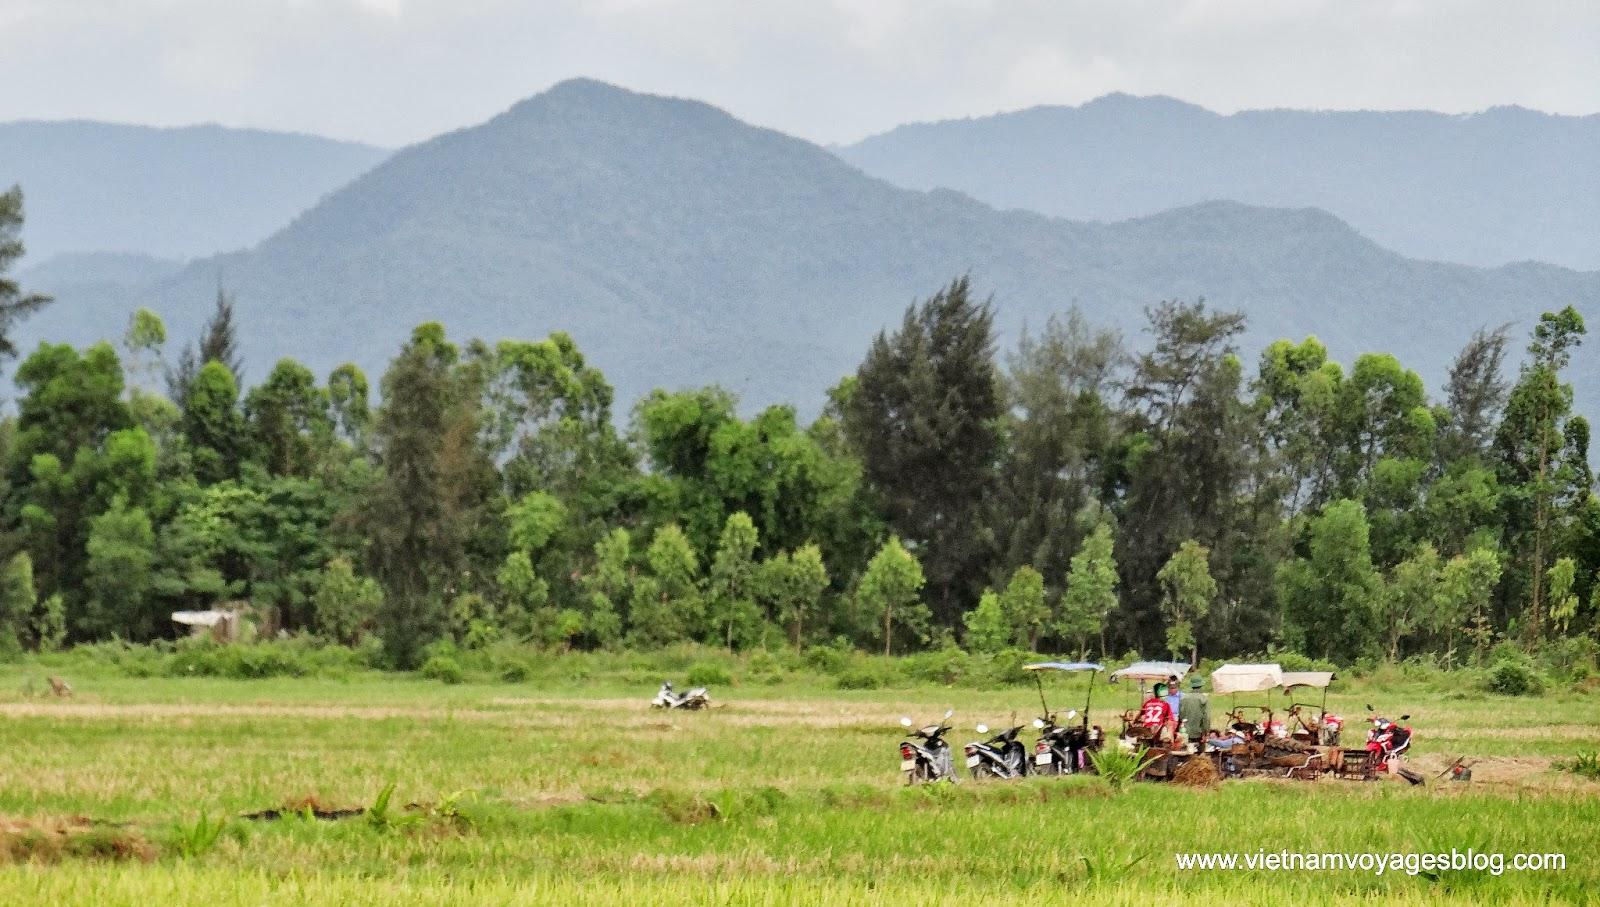 Tham quan khu vực DMZ ở Quảng Trị